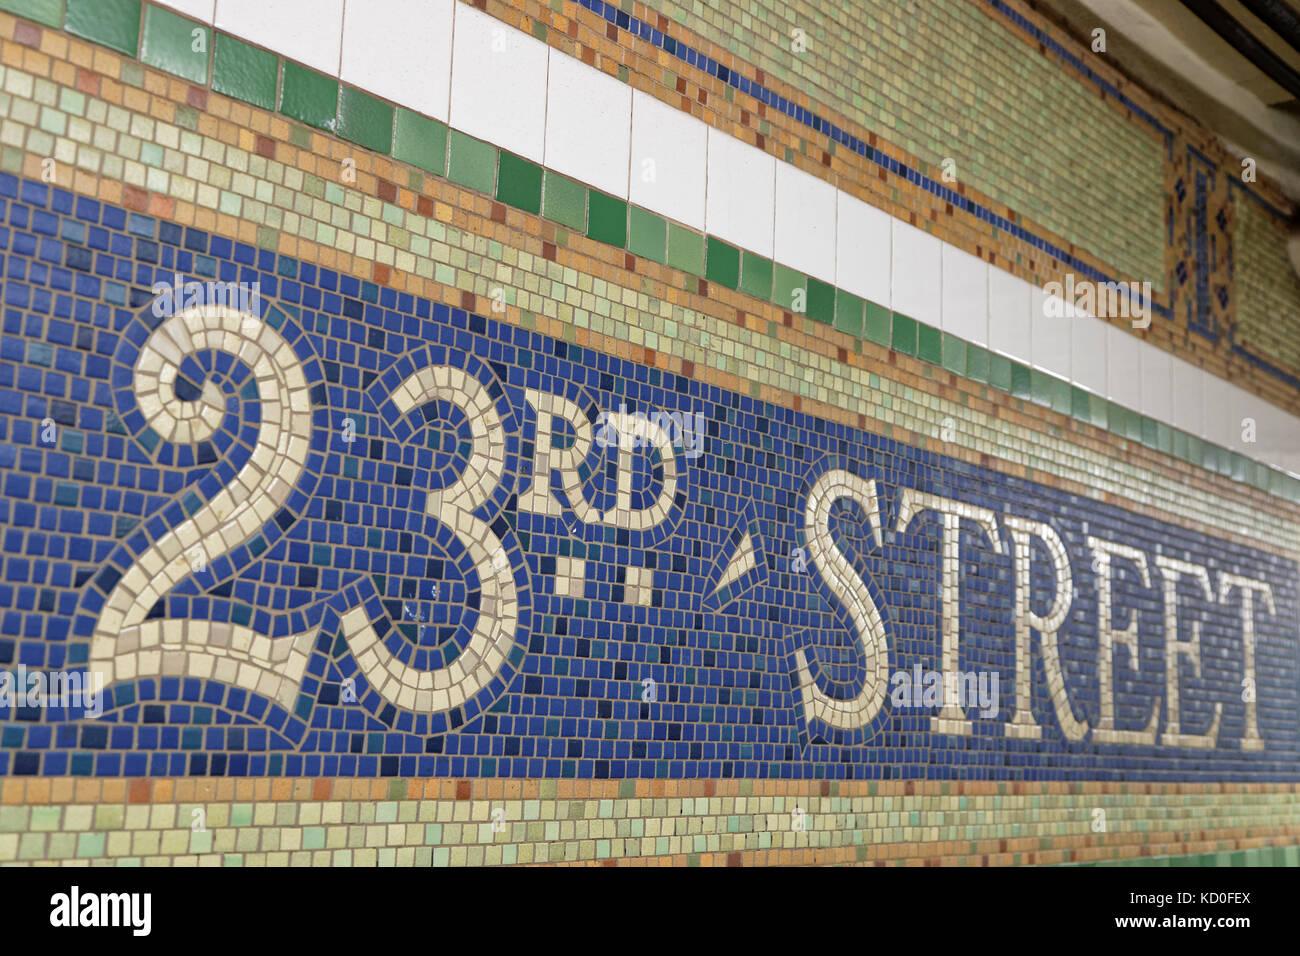 Subway tiles new york stock photos subway tiles new york stock new york city usa september 14 2017 sign on tiles of the biocorpaavc Gallery